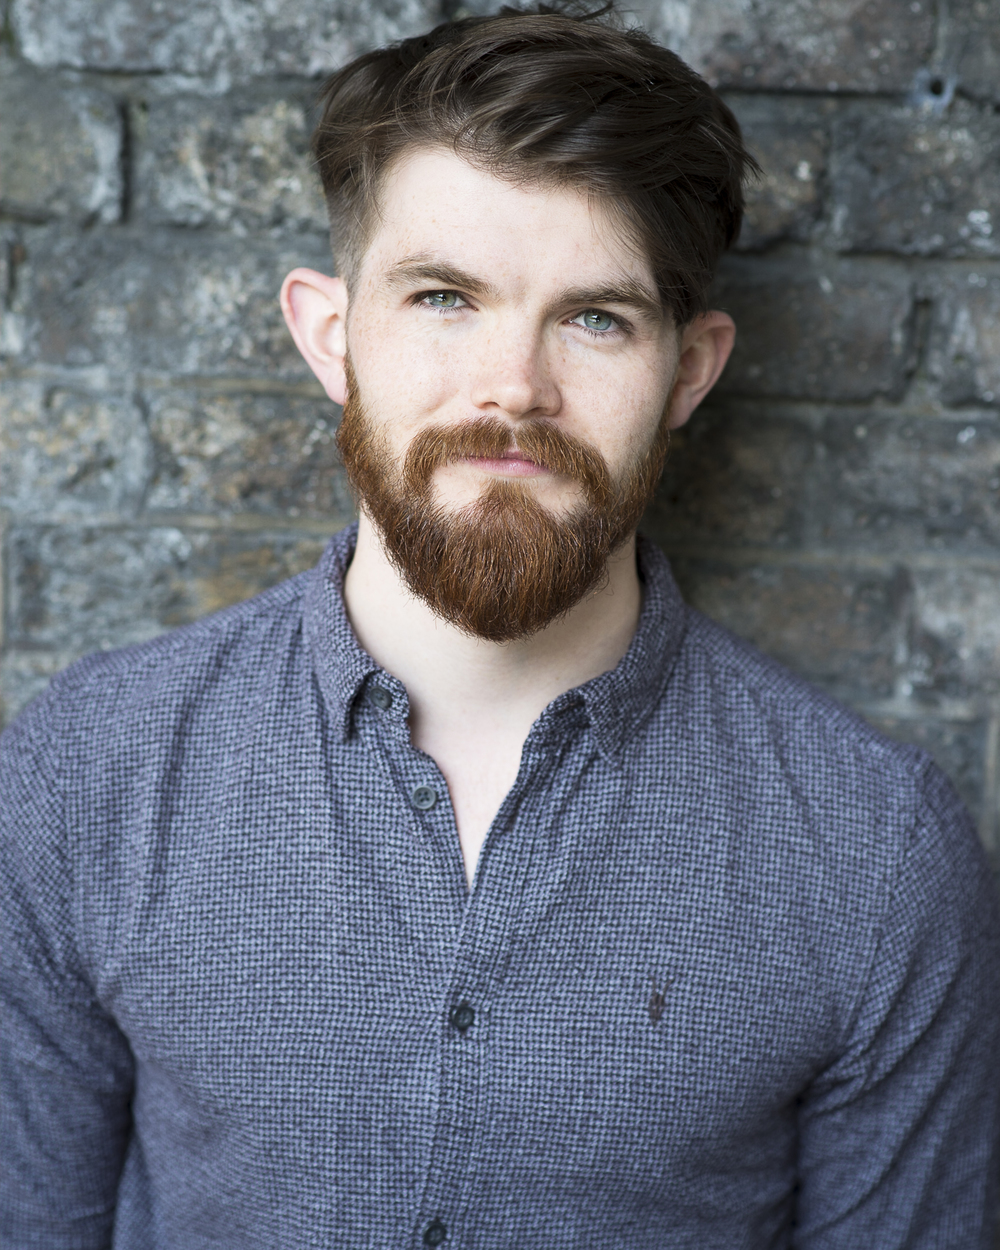 Stewart McCheyne